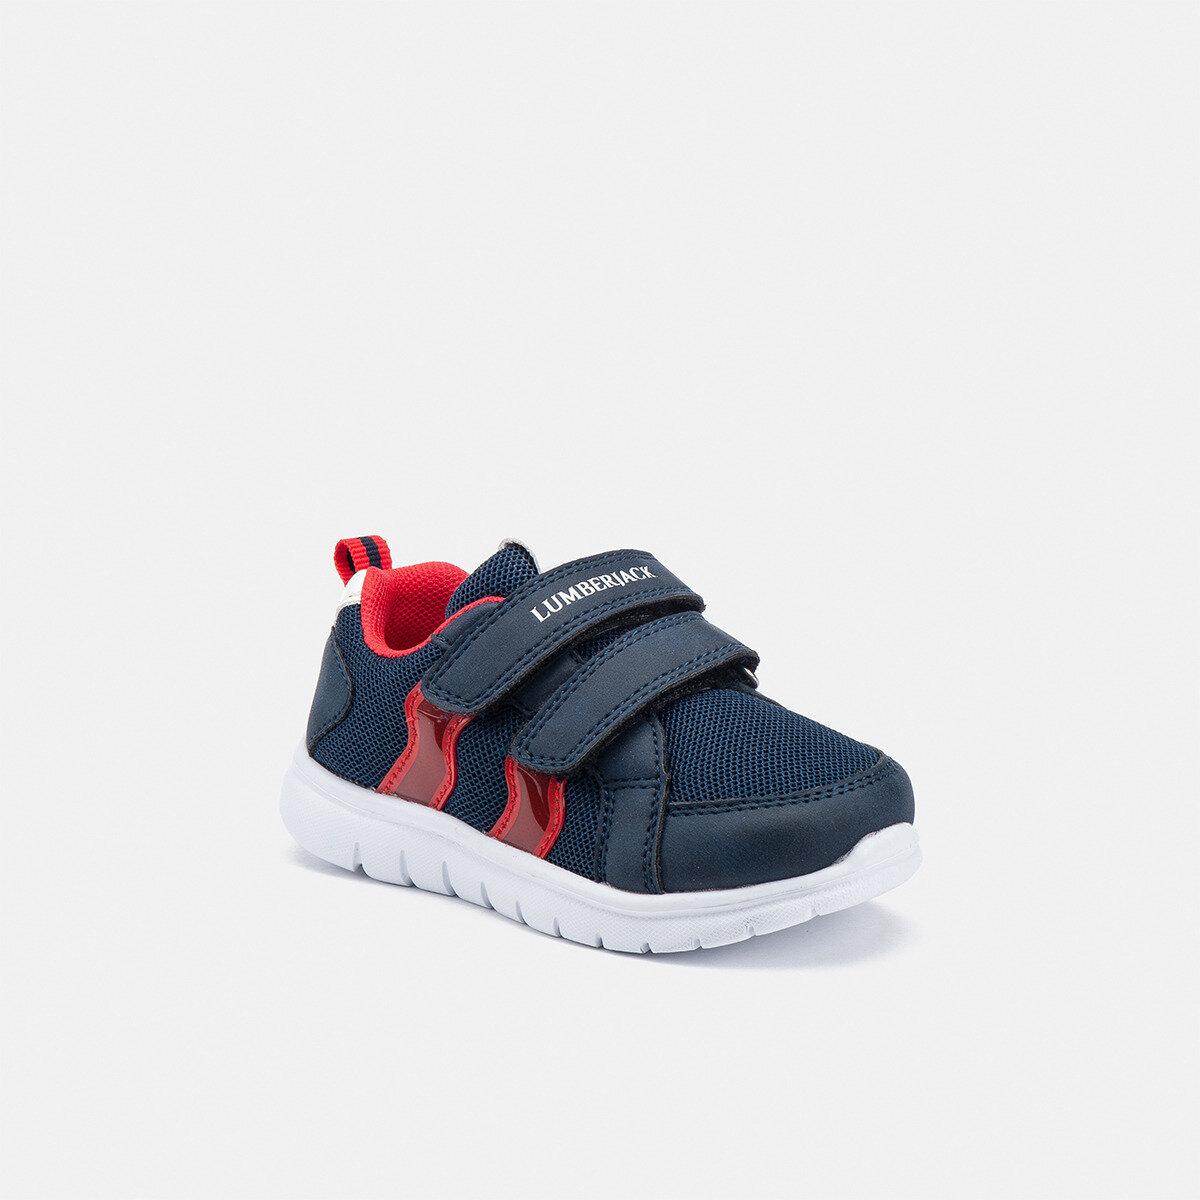 CRASH NAVY BLUE/RED Boy Sneakers